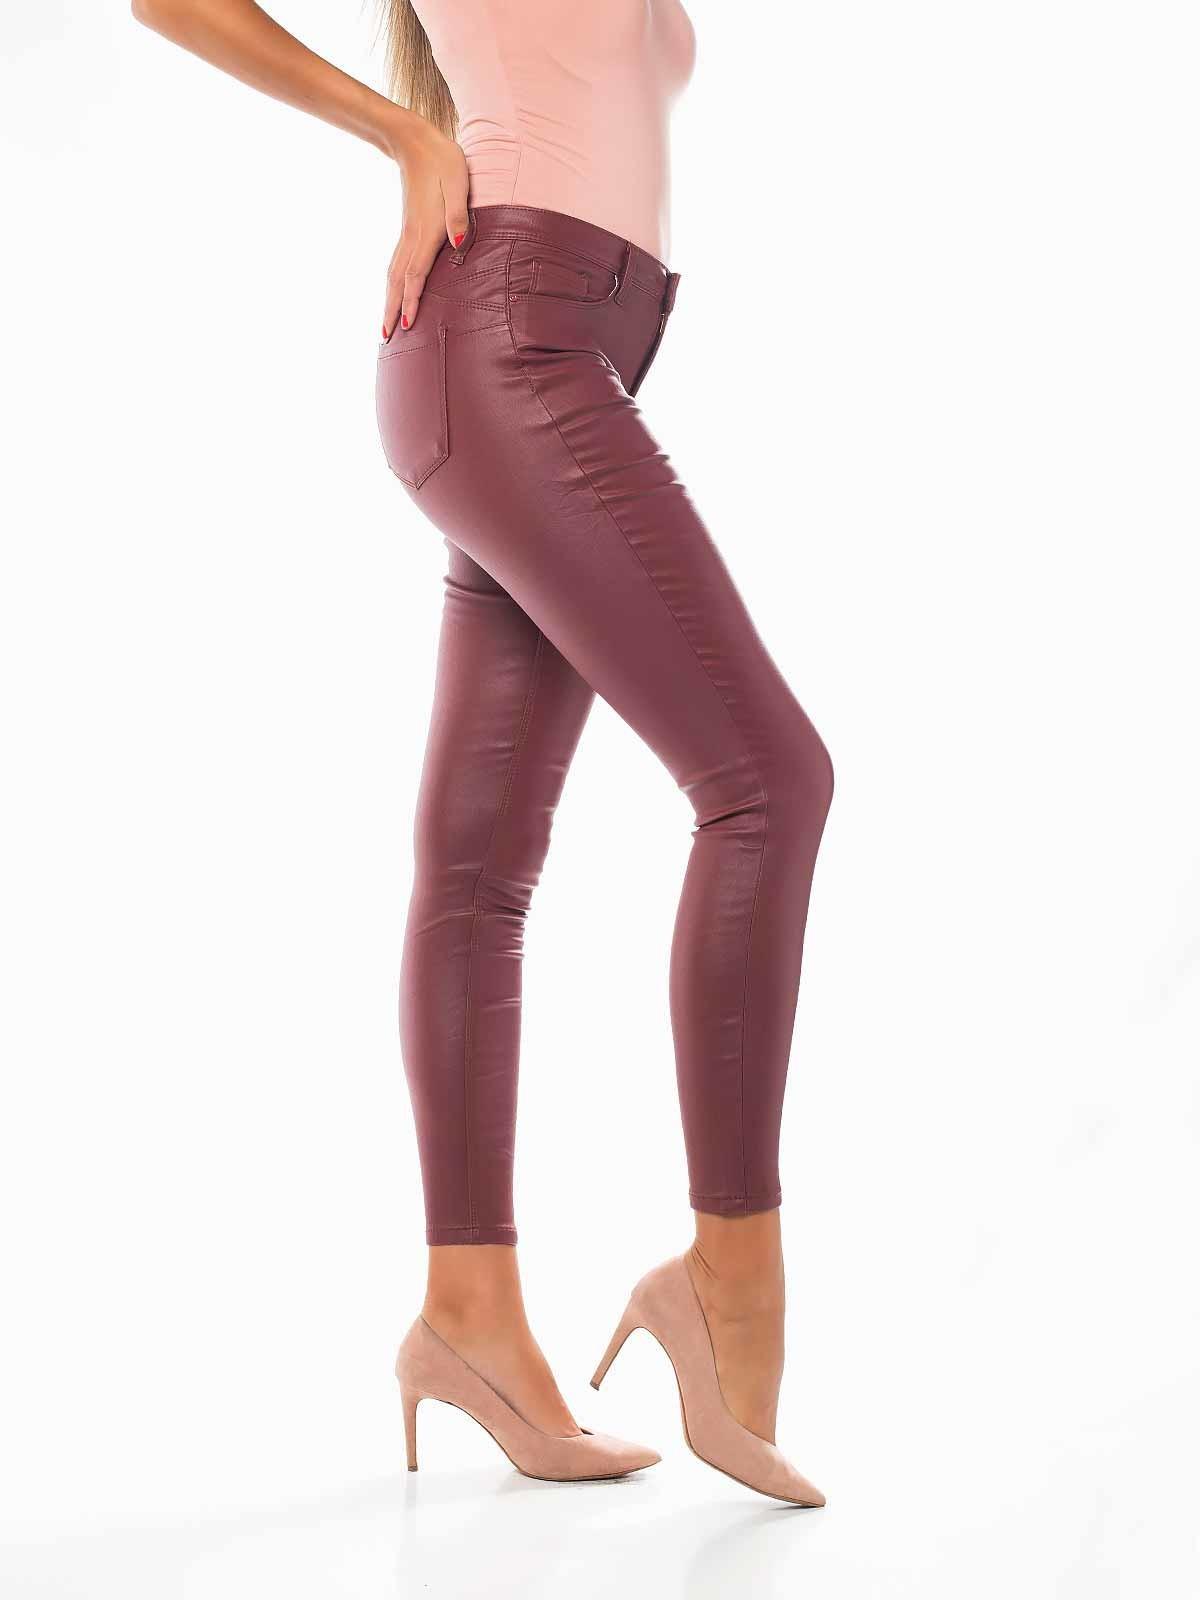 Pantalón push up piel sintética burdeos